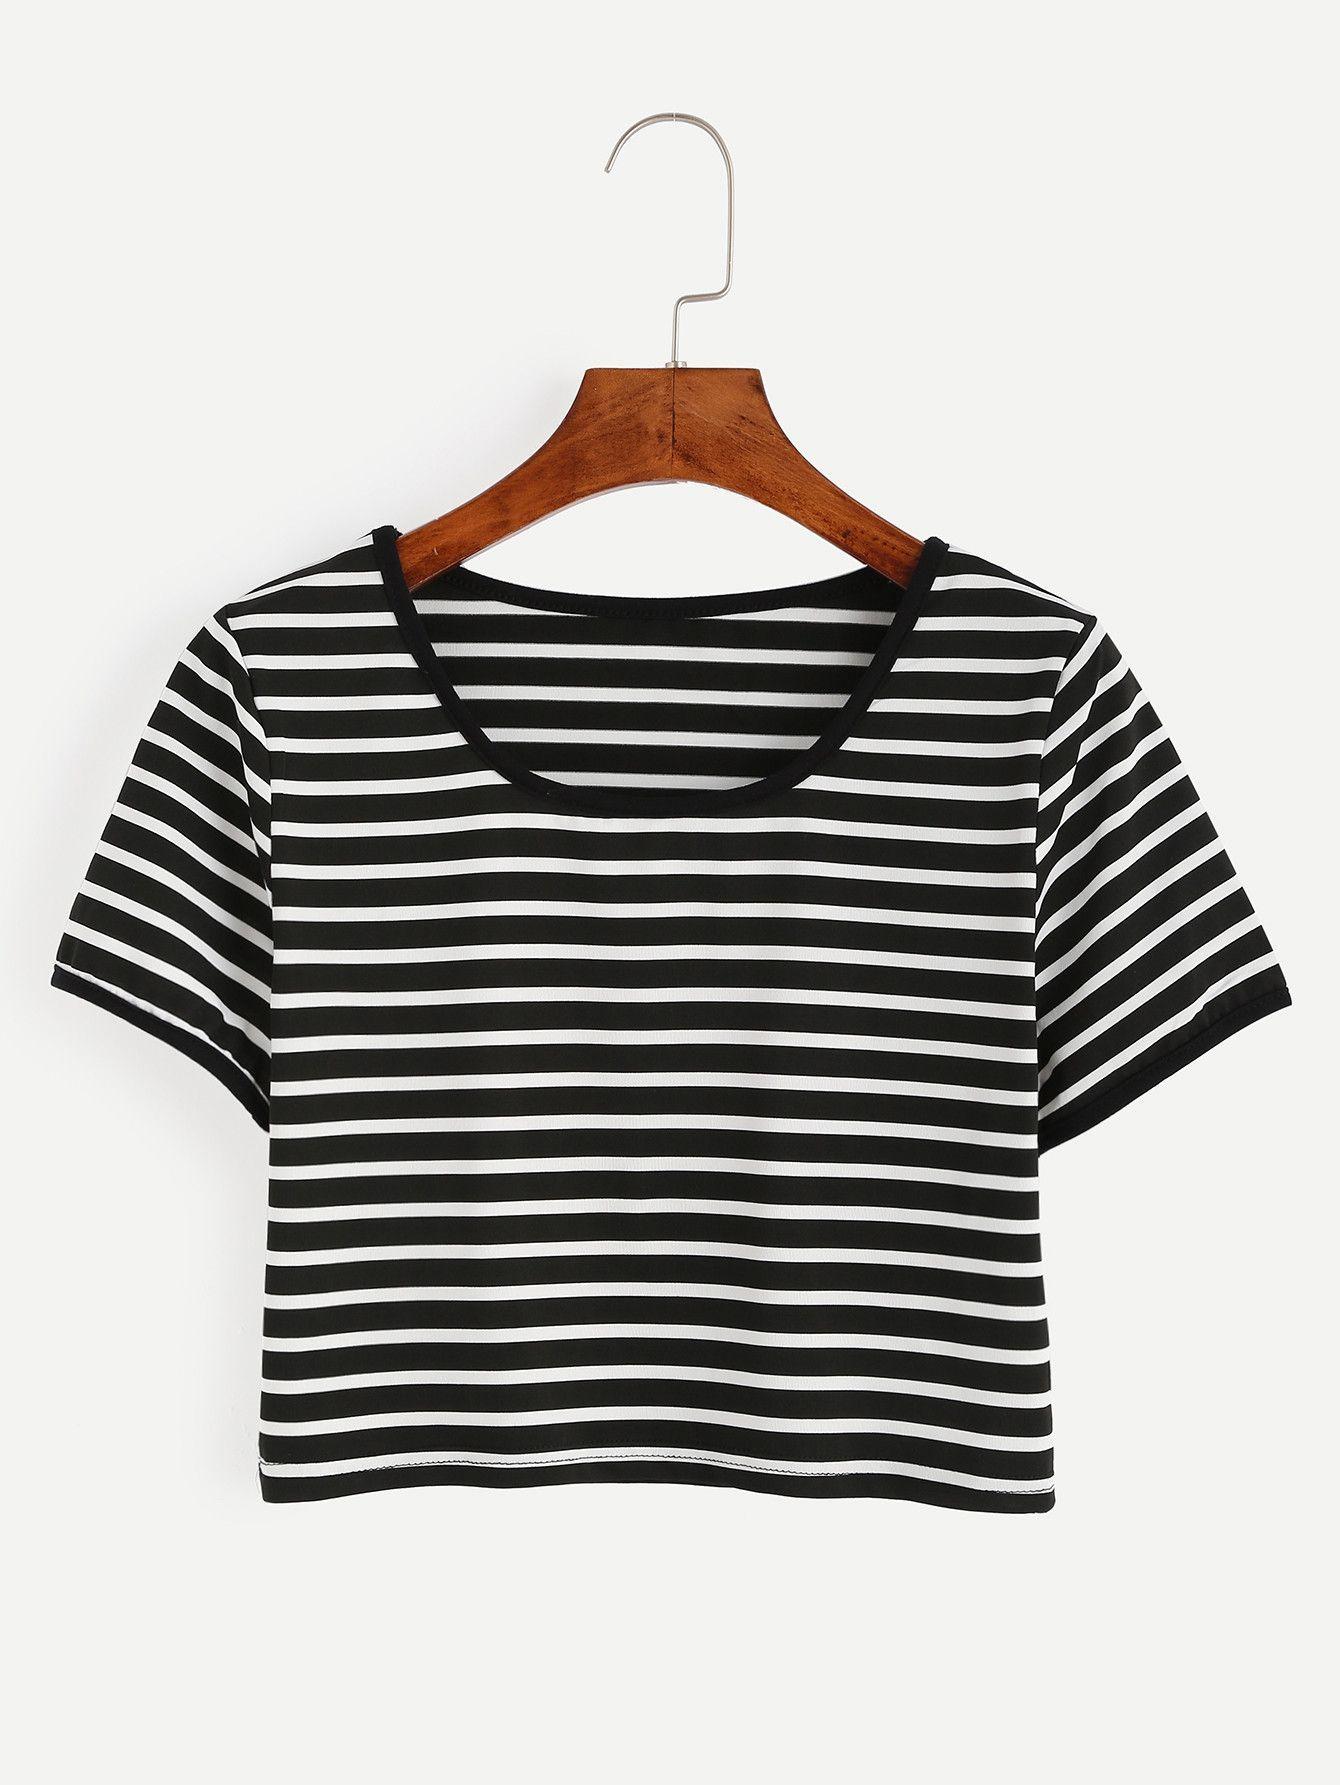 a51a96440f4 Black and White Striped Crop T-shirt EmmaCloth-Women Fast Fashion Online